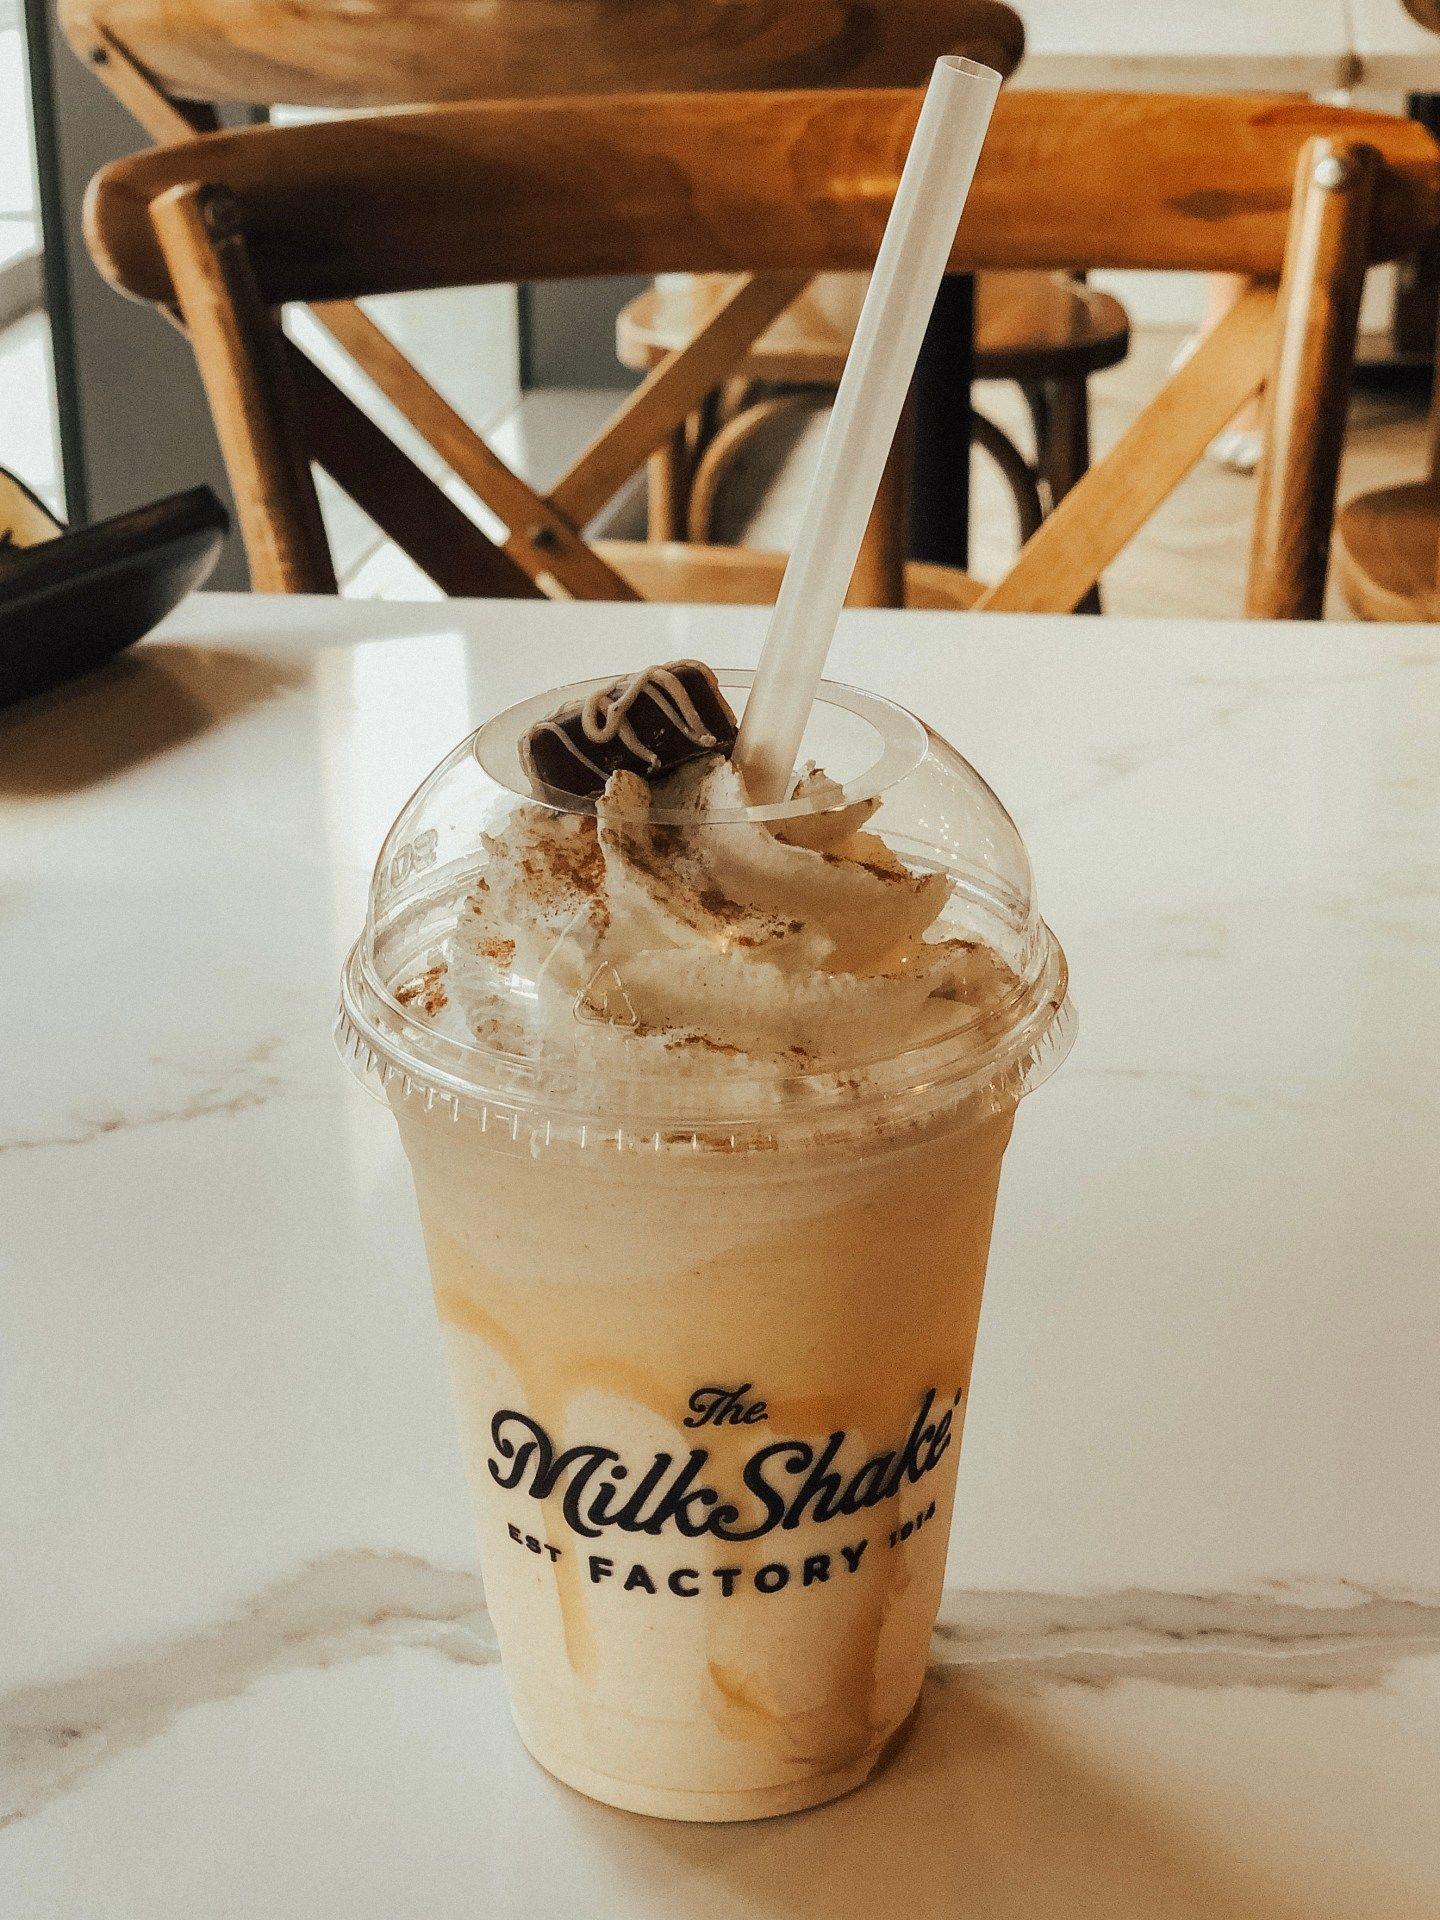 Lost With Jen The Milkshake Factory Boozy Milkshake Food Drinks Dessert Soda Fountain